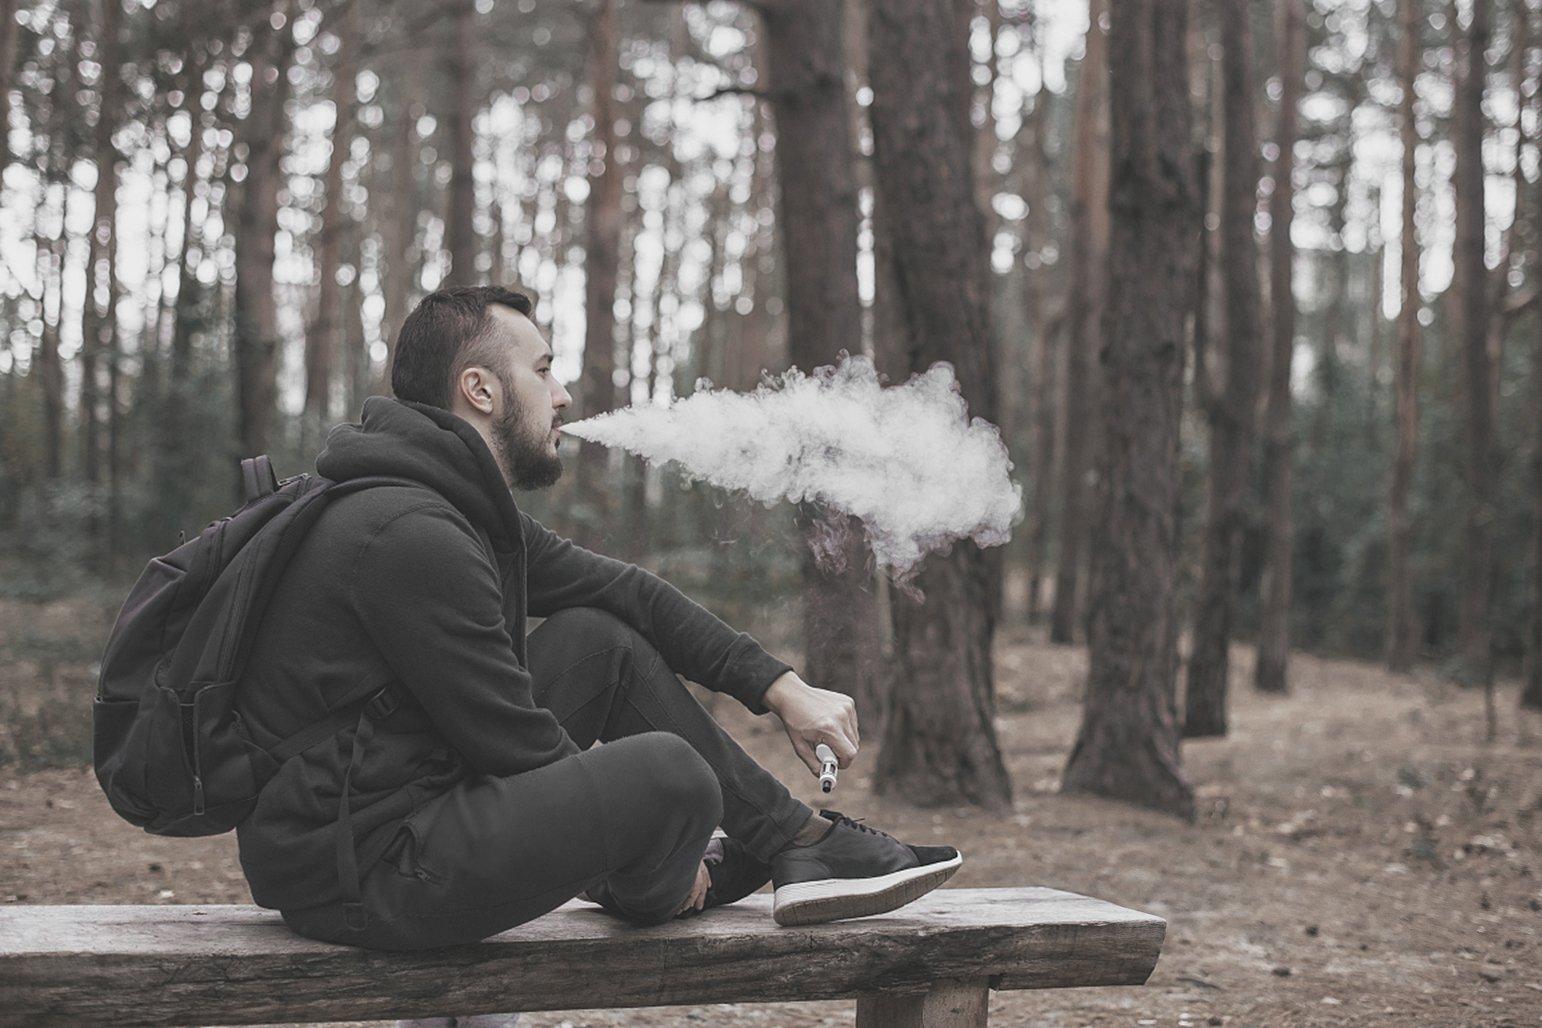 Relx 電子タバコがニコチン塩を使用する理由は? | Vapepenzone Japan